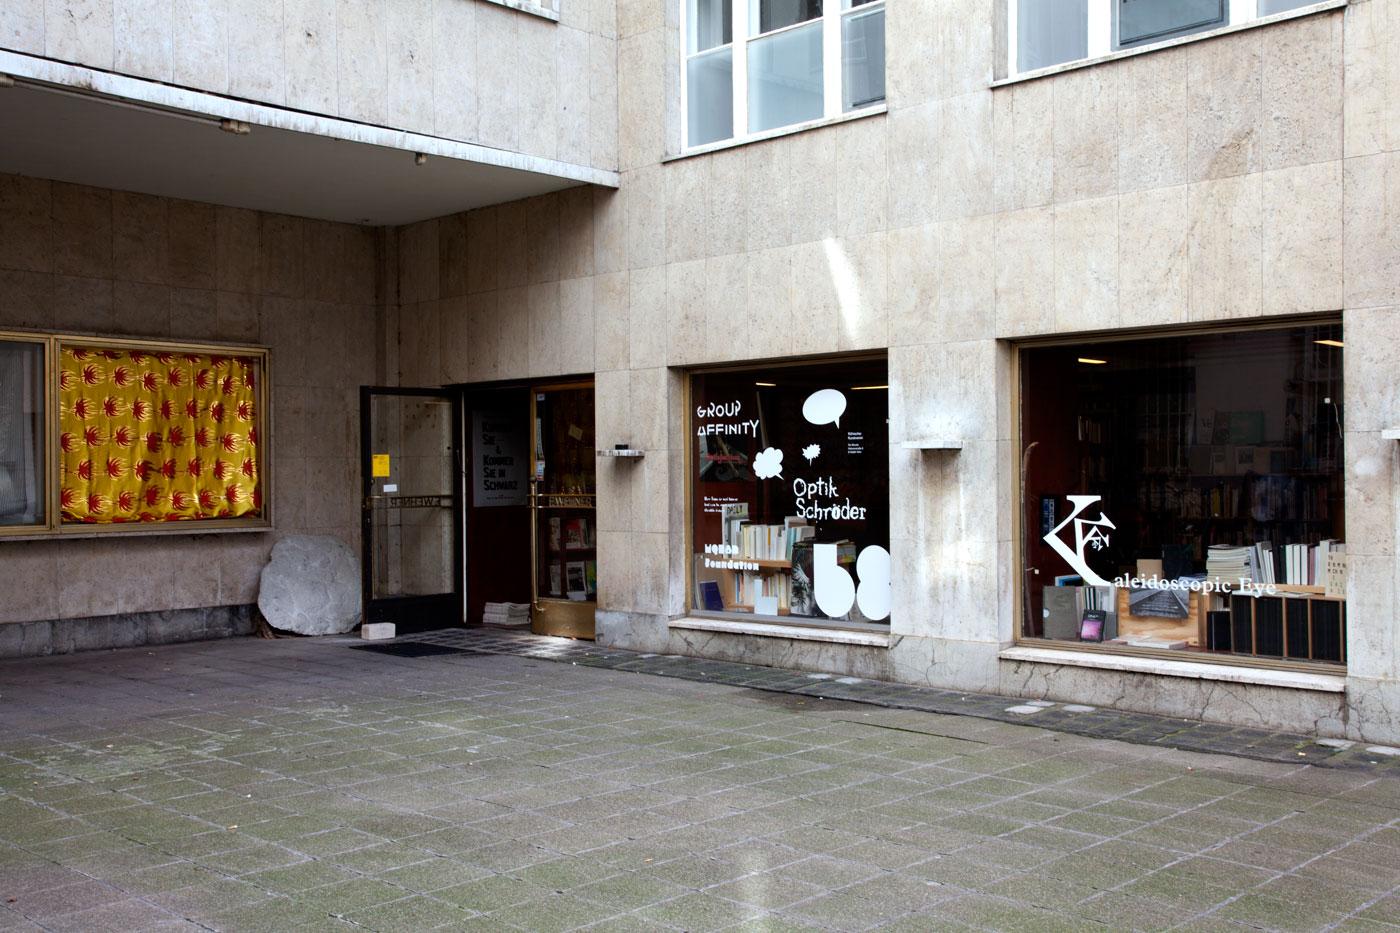 Motto, berlin, berlin, Germany - Bookstore